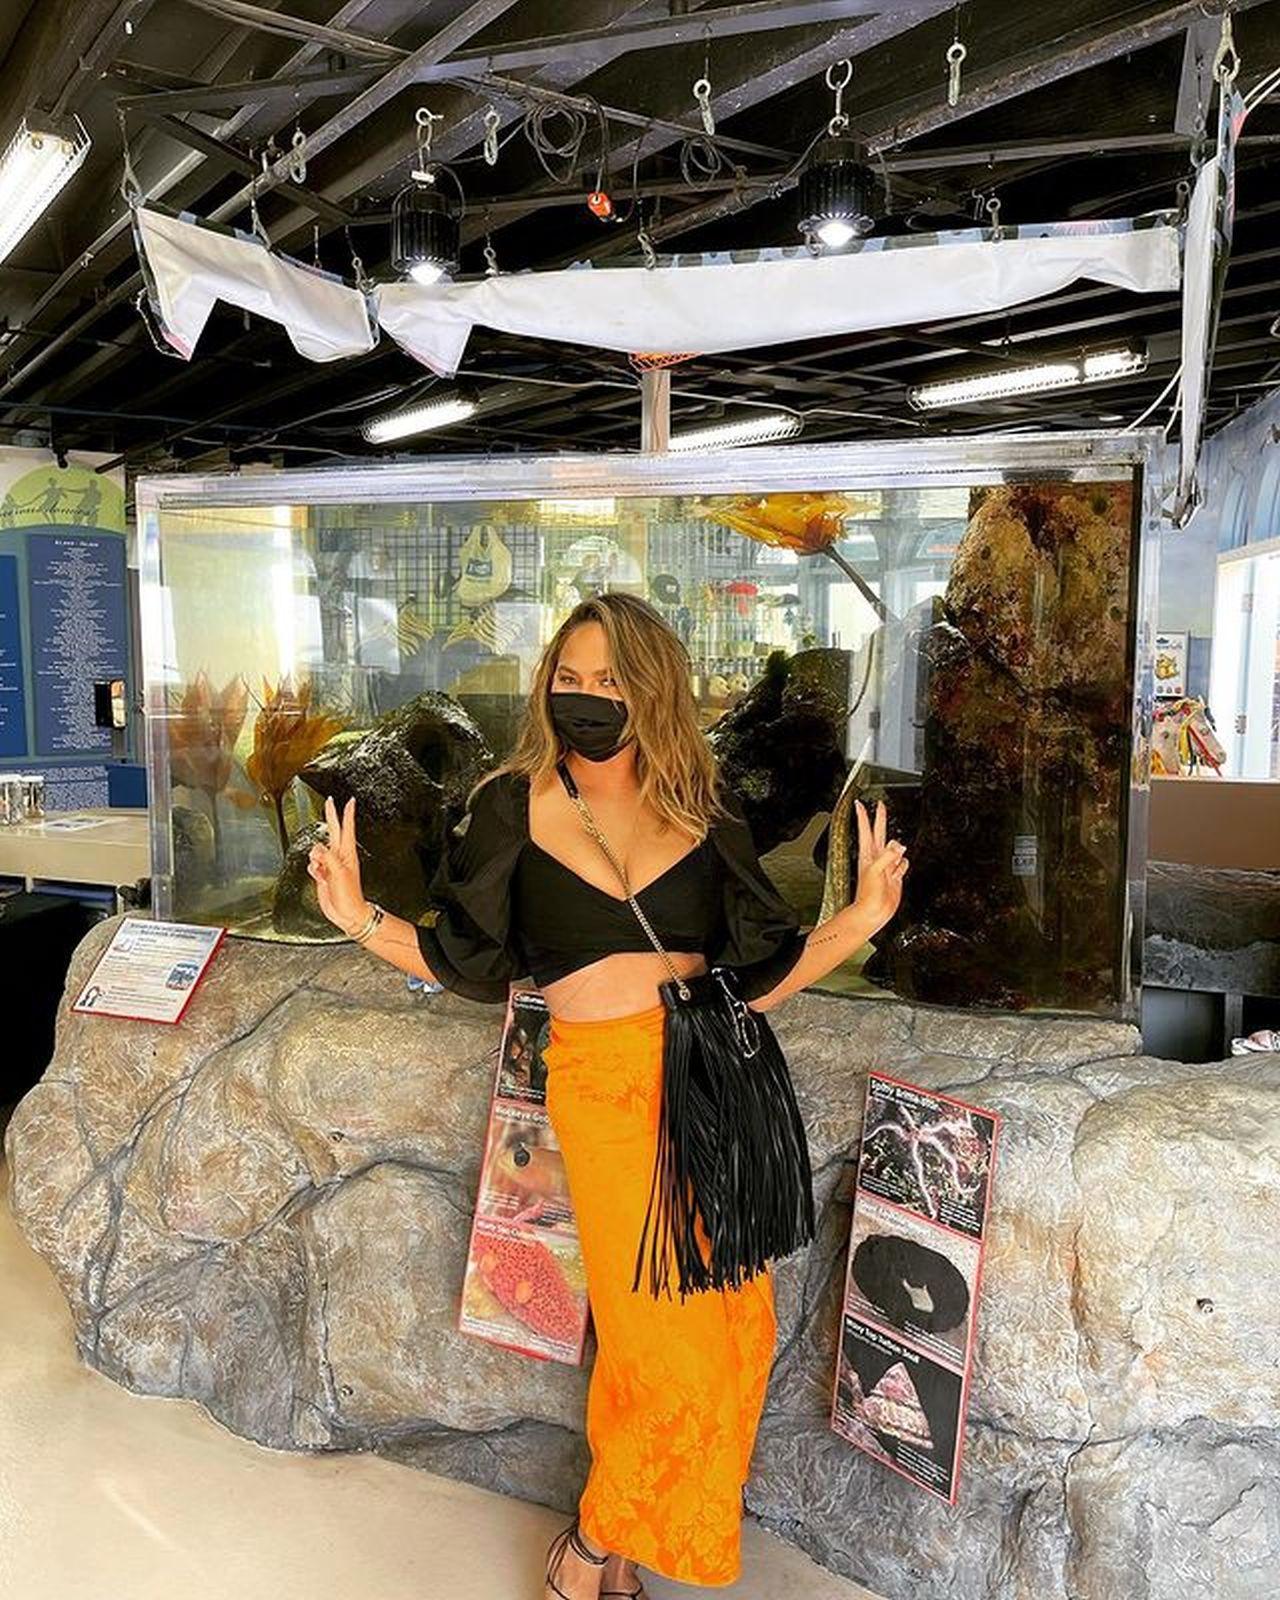 Chrissy Teigen Stuns In A Wrap Skirt And Crop Top